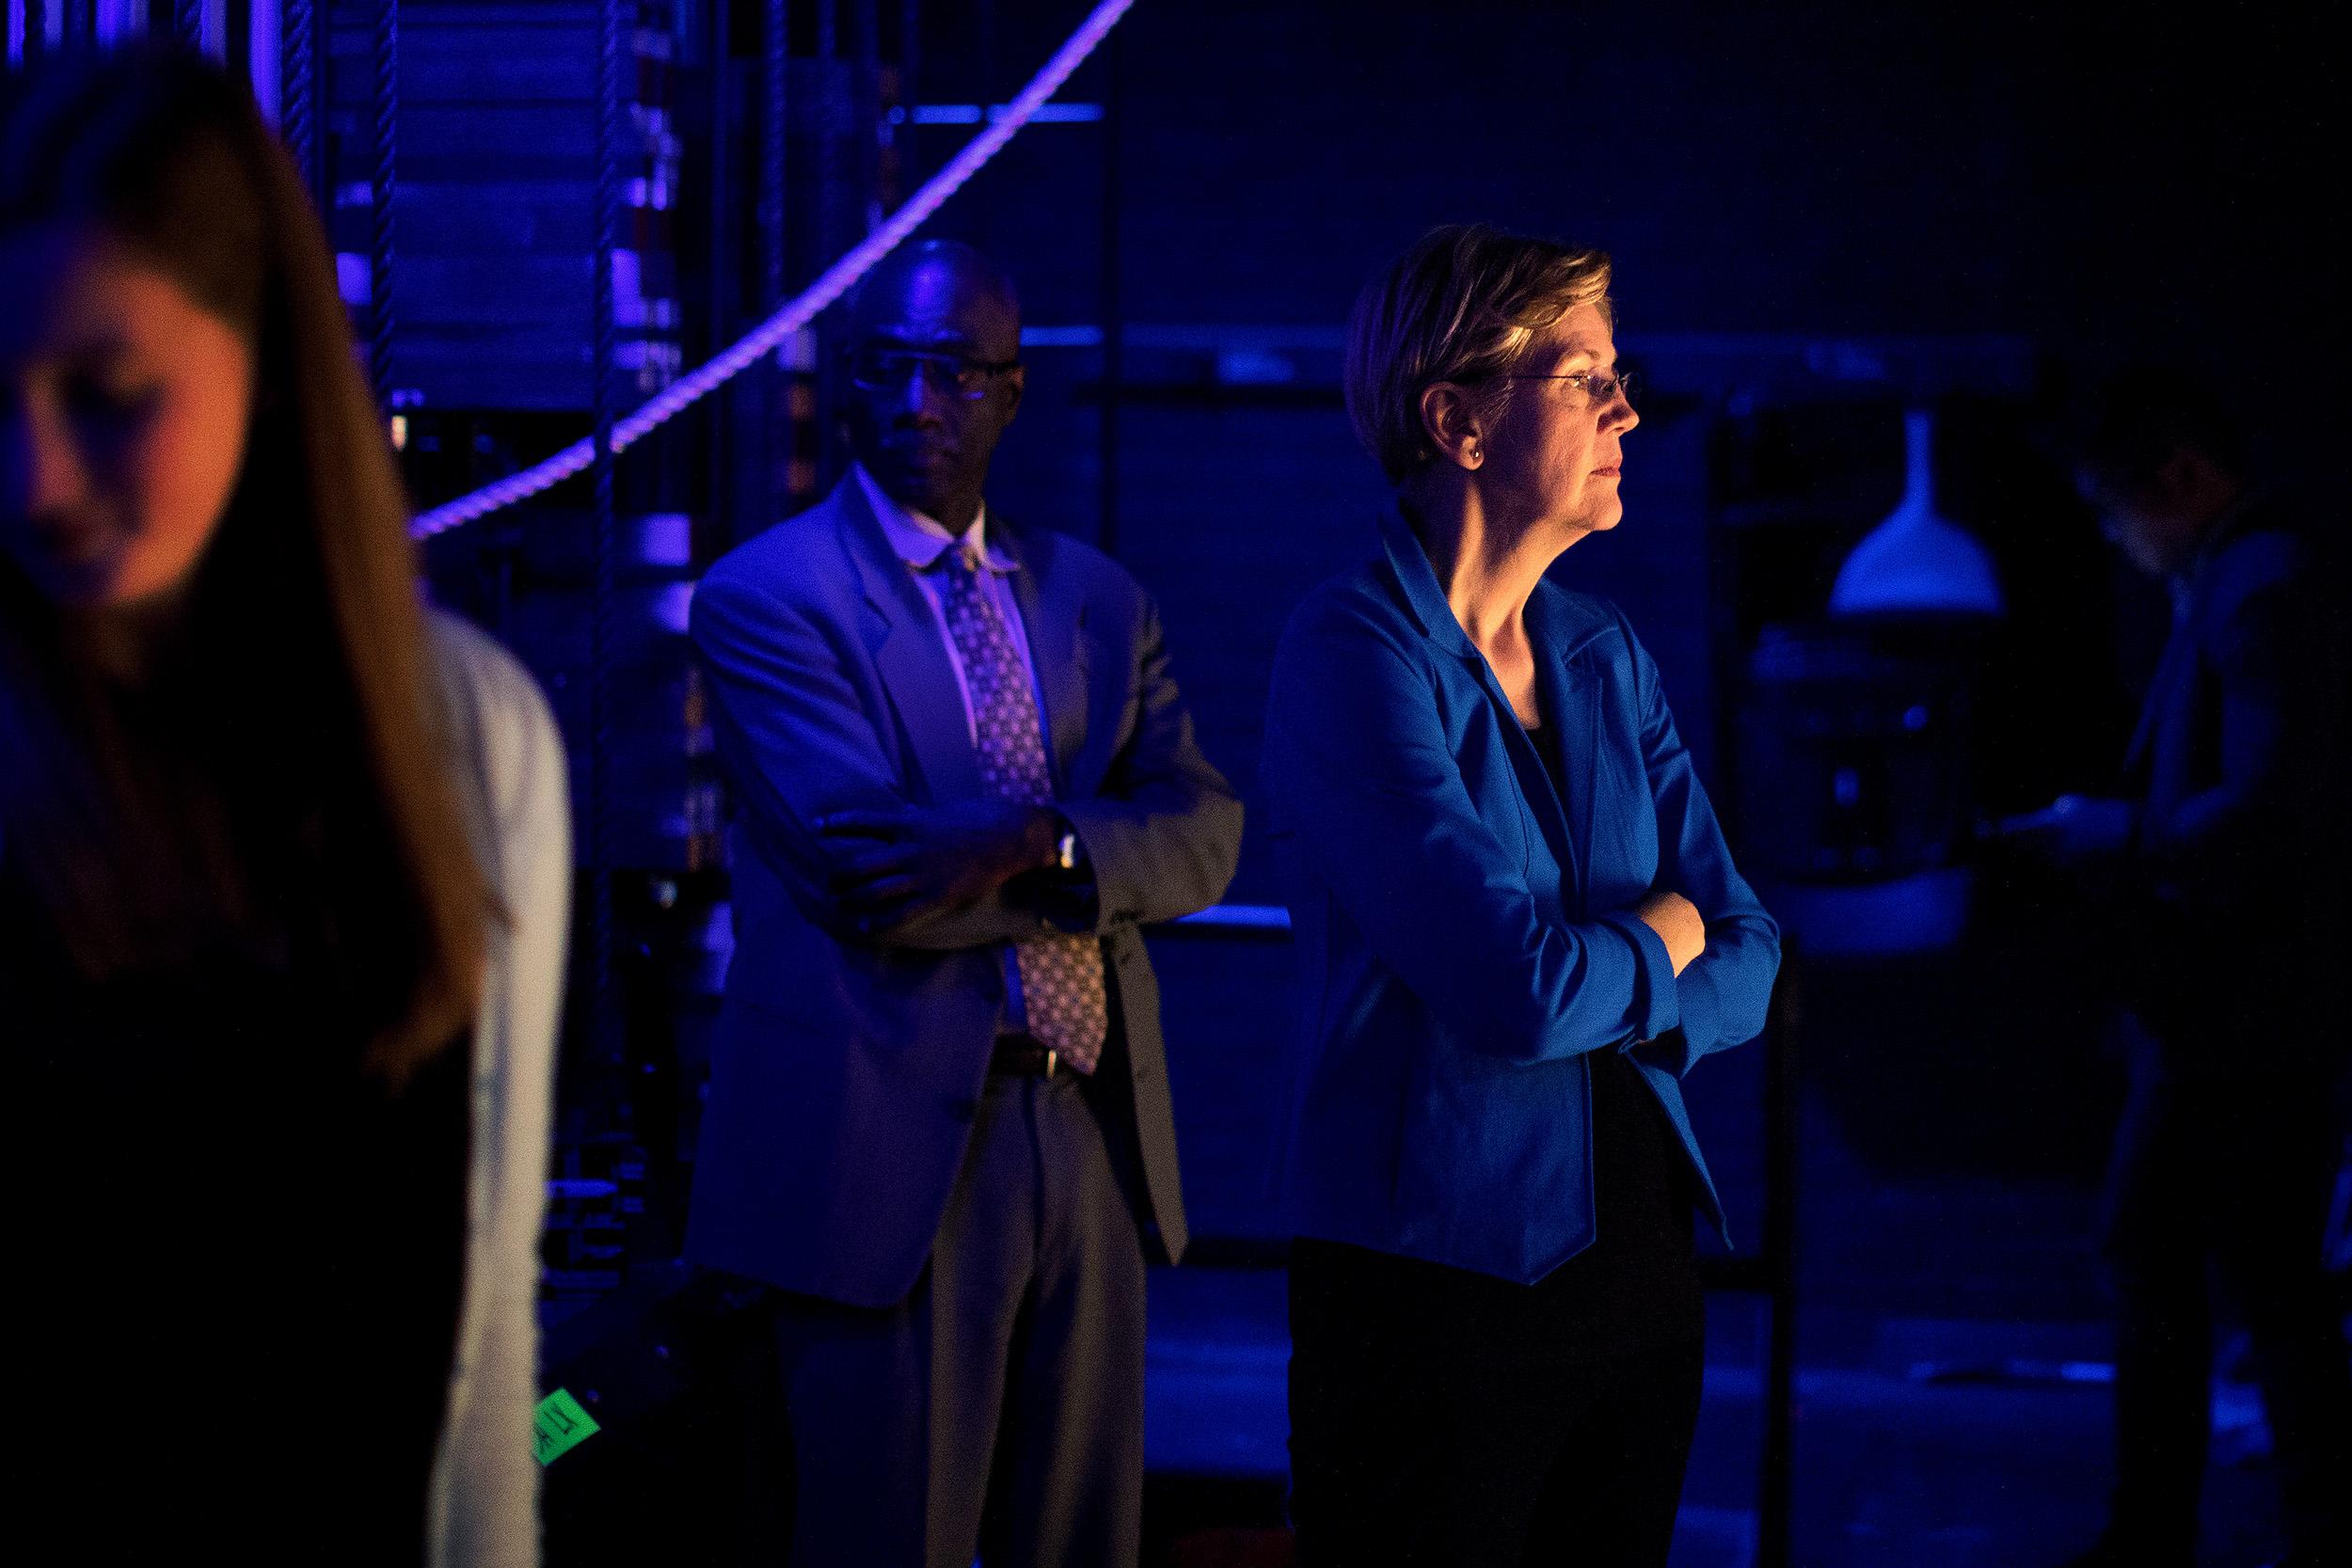 Elizabeth Warren back stage before her campaign speech.